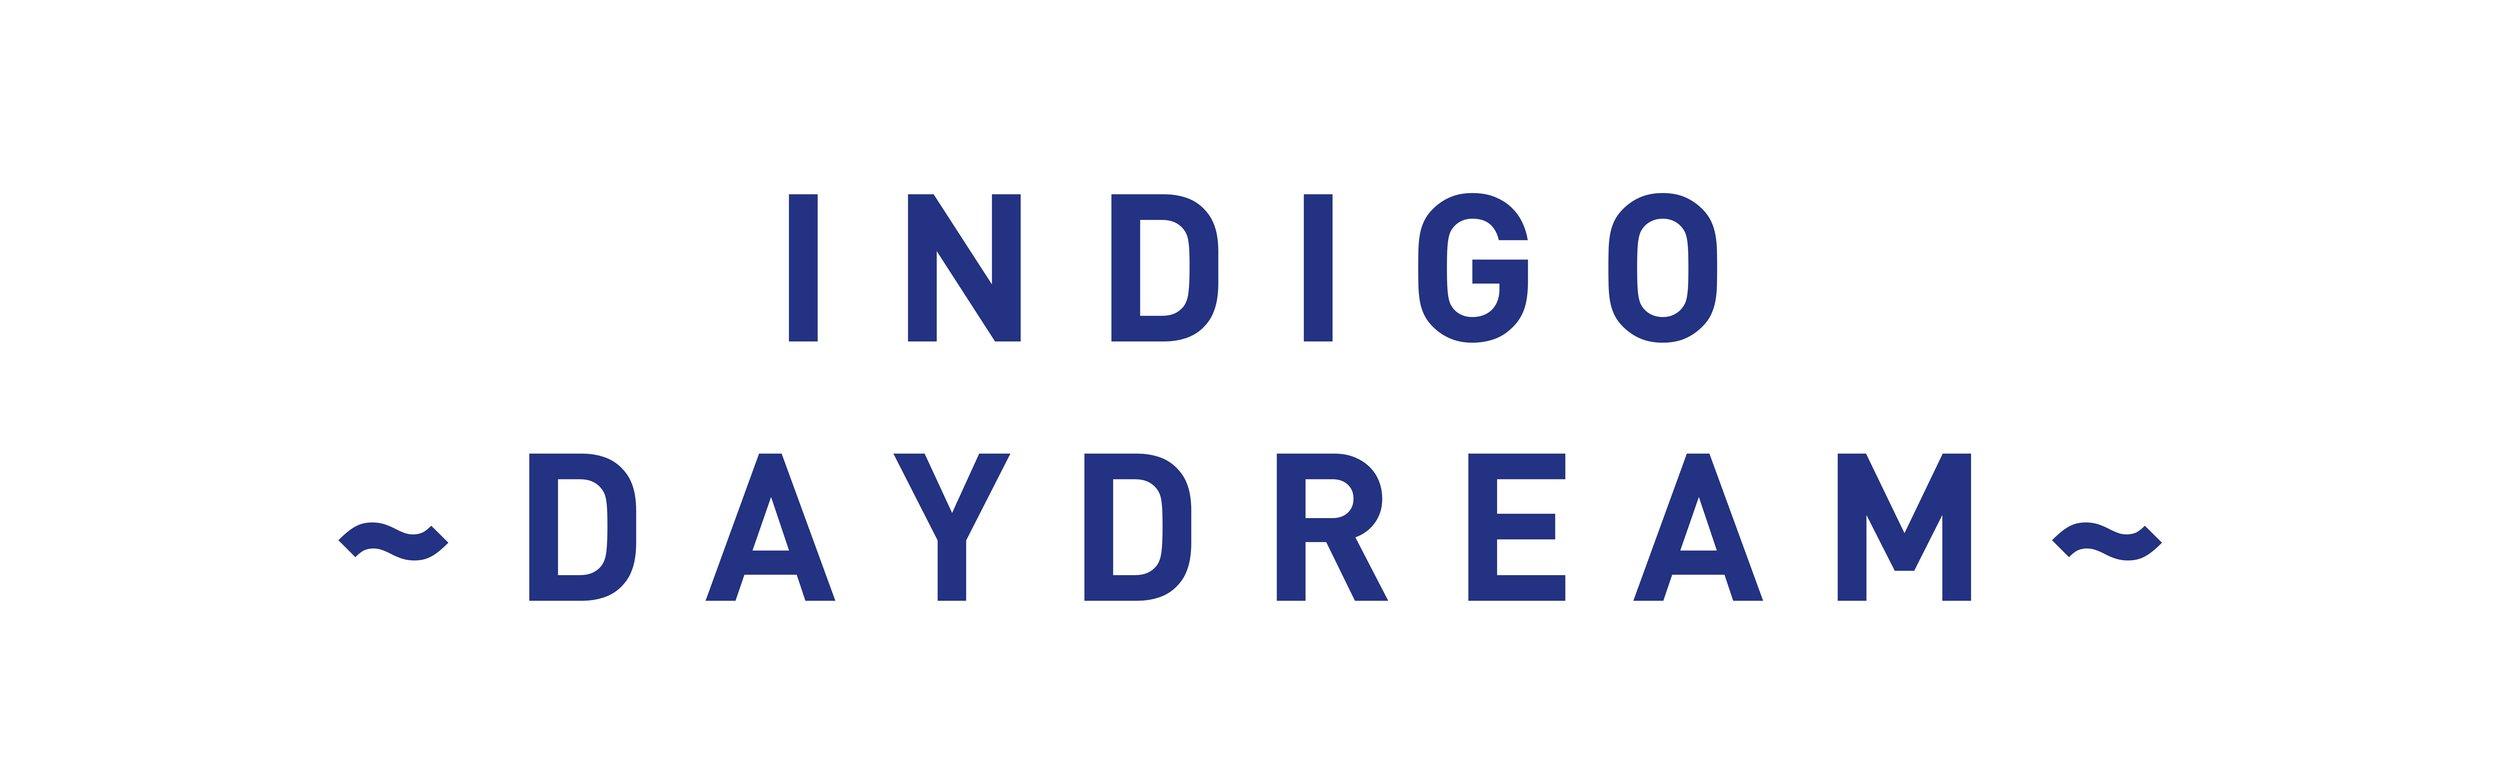 indigo daydream.jpg